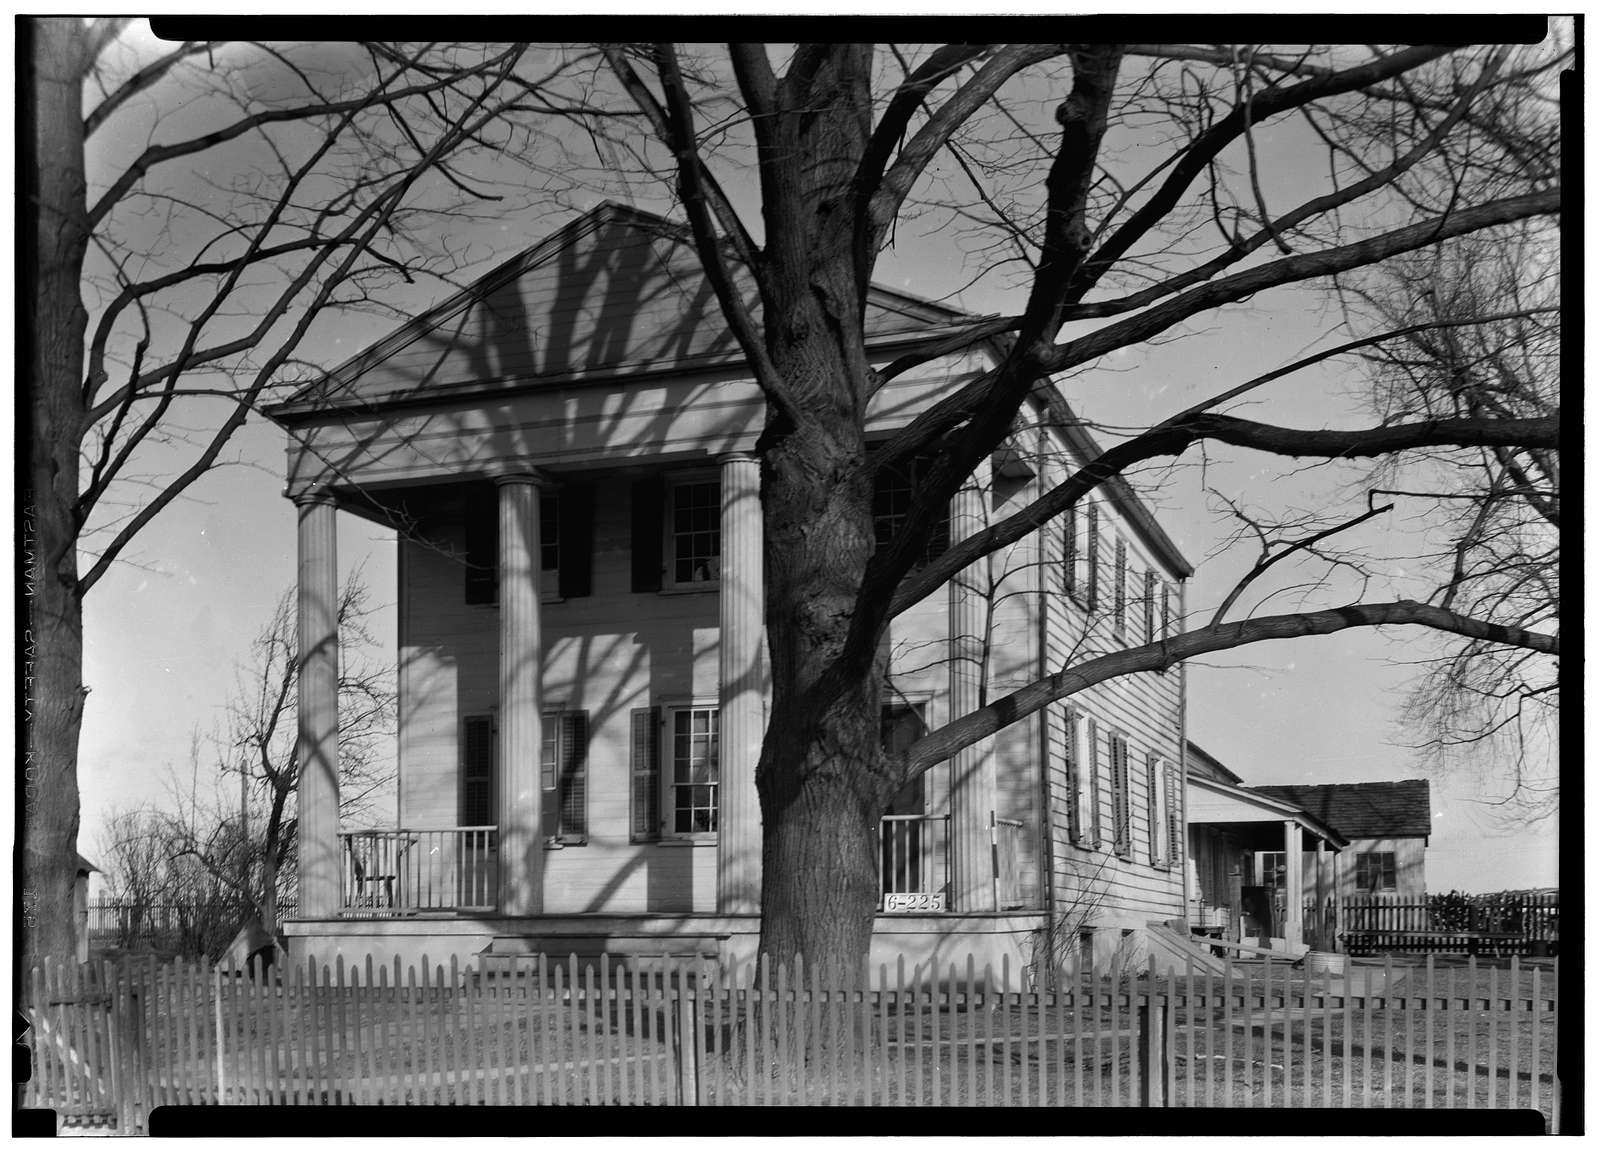 Colonel Dean Britton House, Dey Road, Plainsboro, Middlesex County, NJ